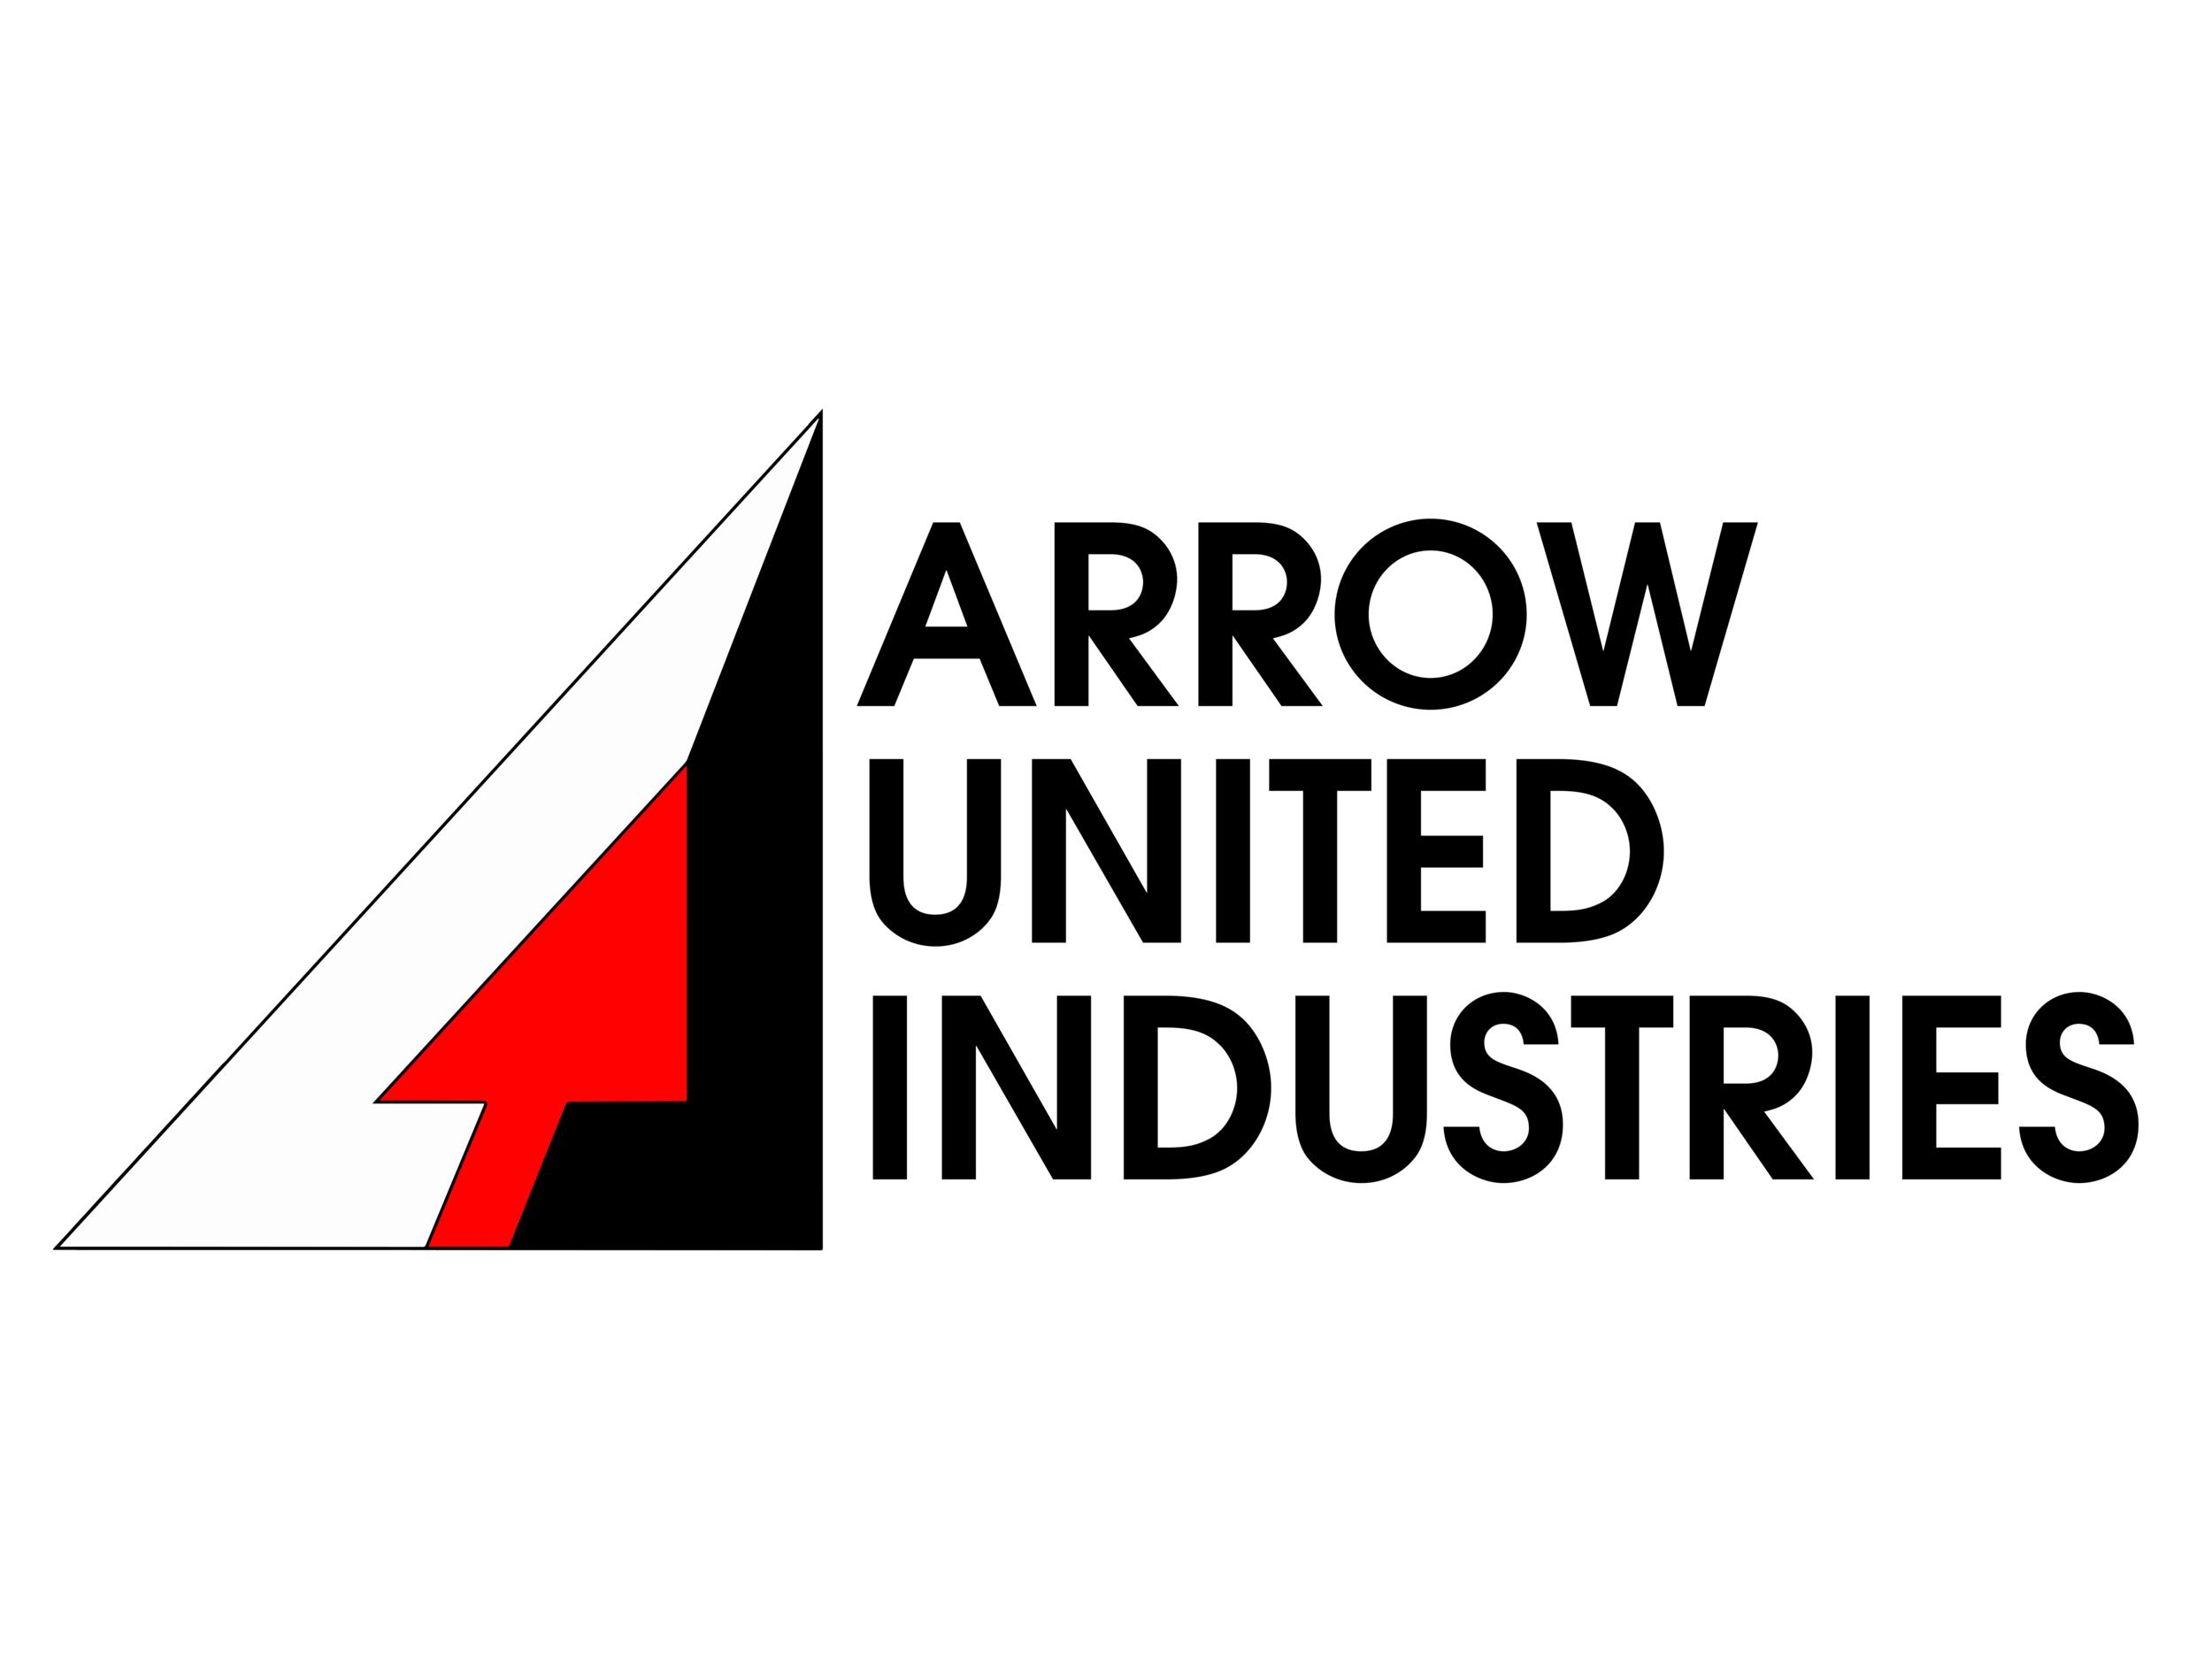 Arrow United Industries Logo 2018 SDFSDF.png